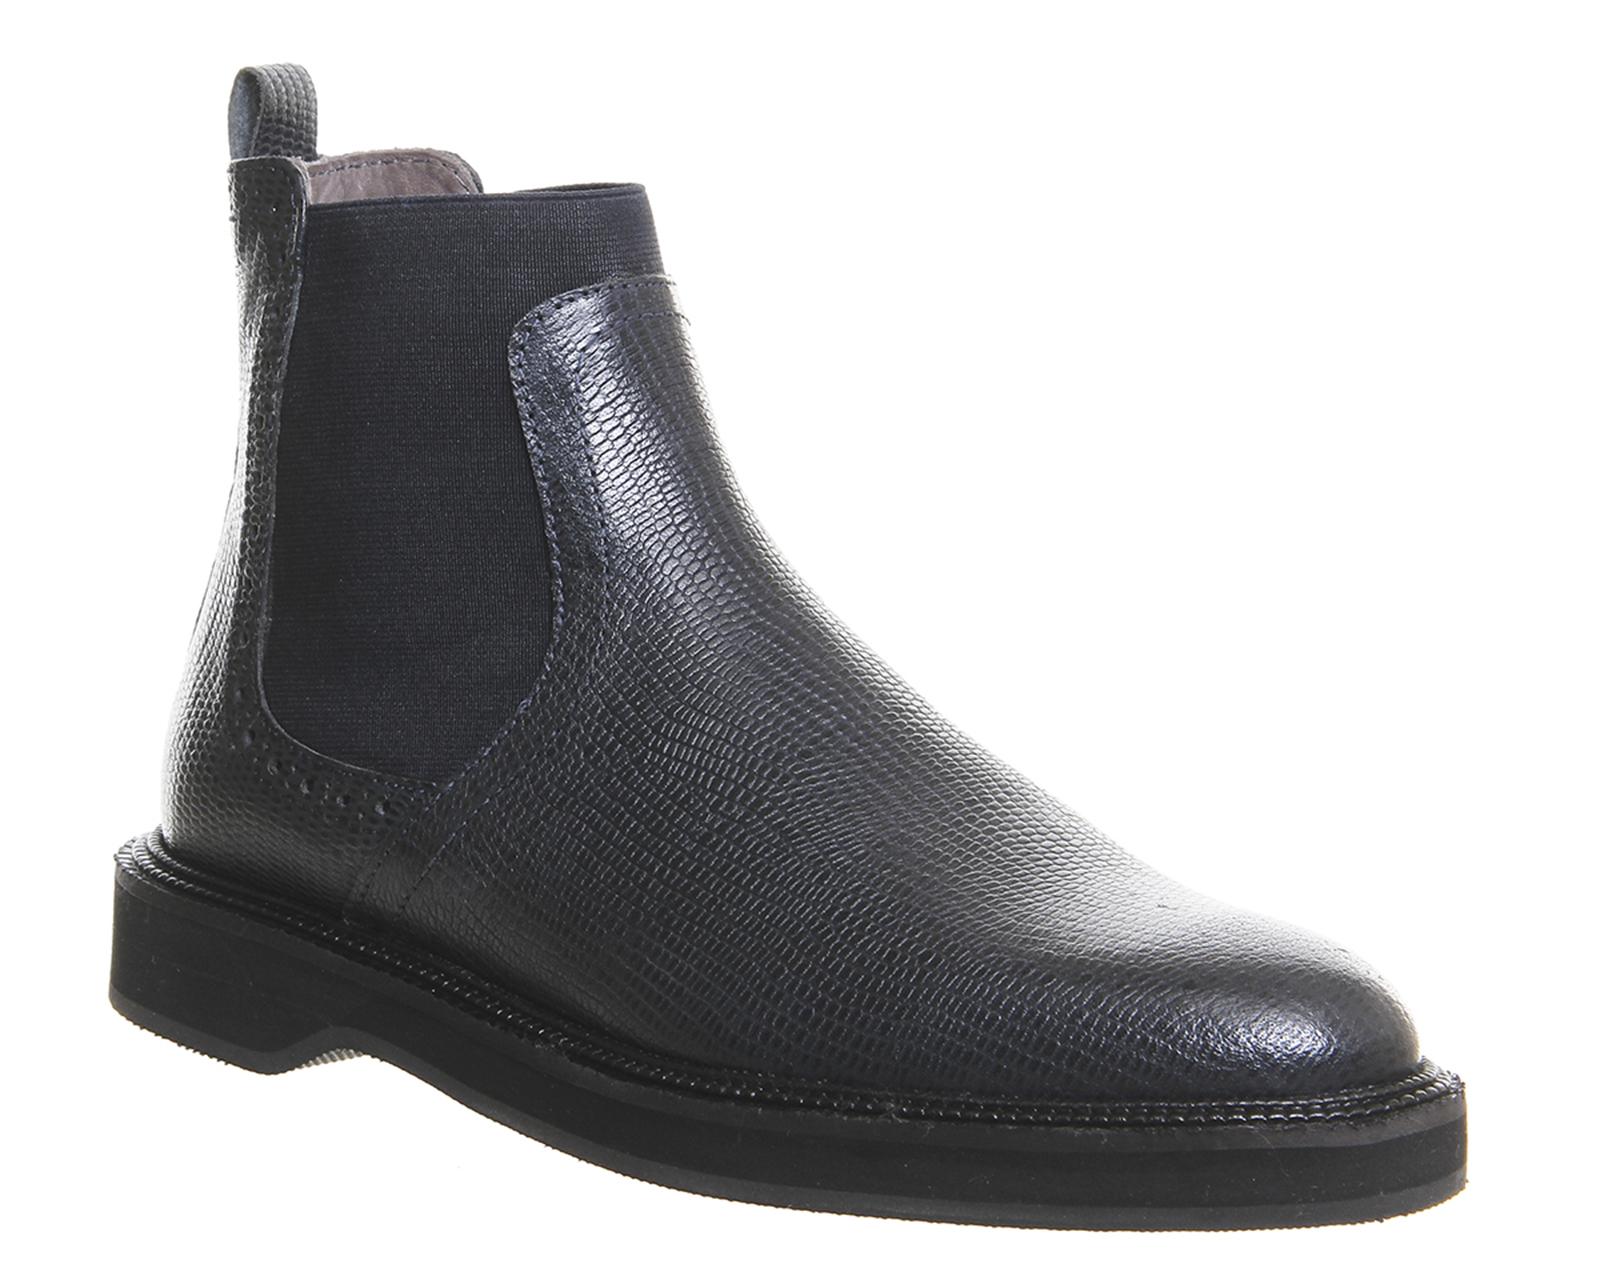 h by hudson bopp chelsea boots in black lyst. Black Bedroom Furniture Sets. Home Design Ideas